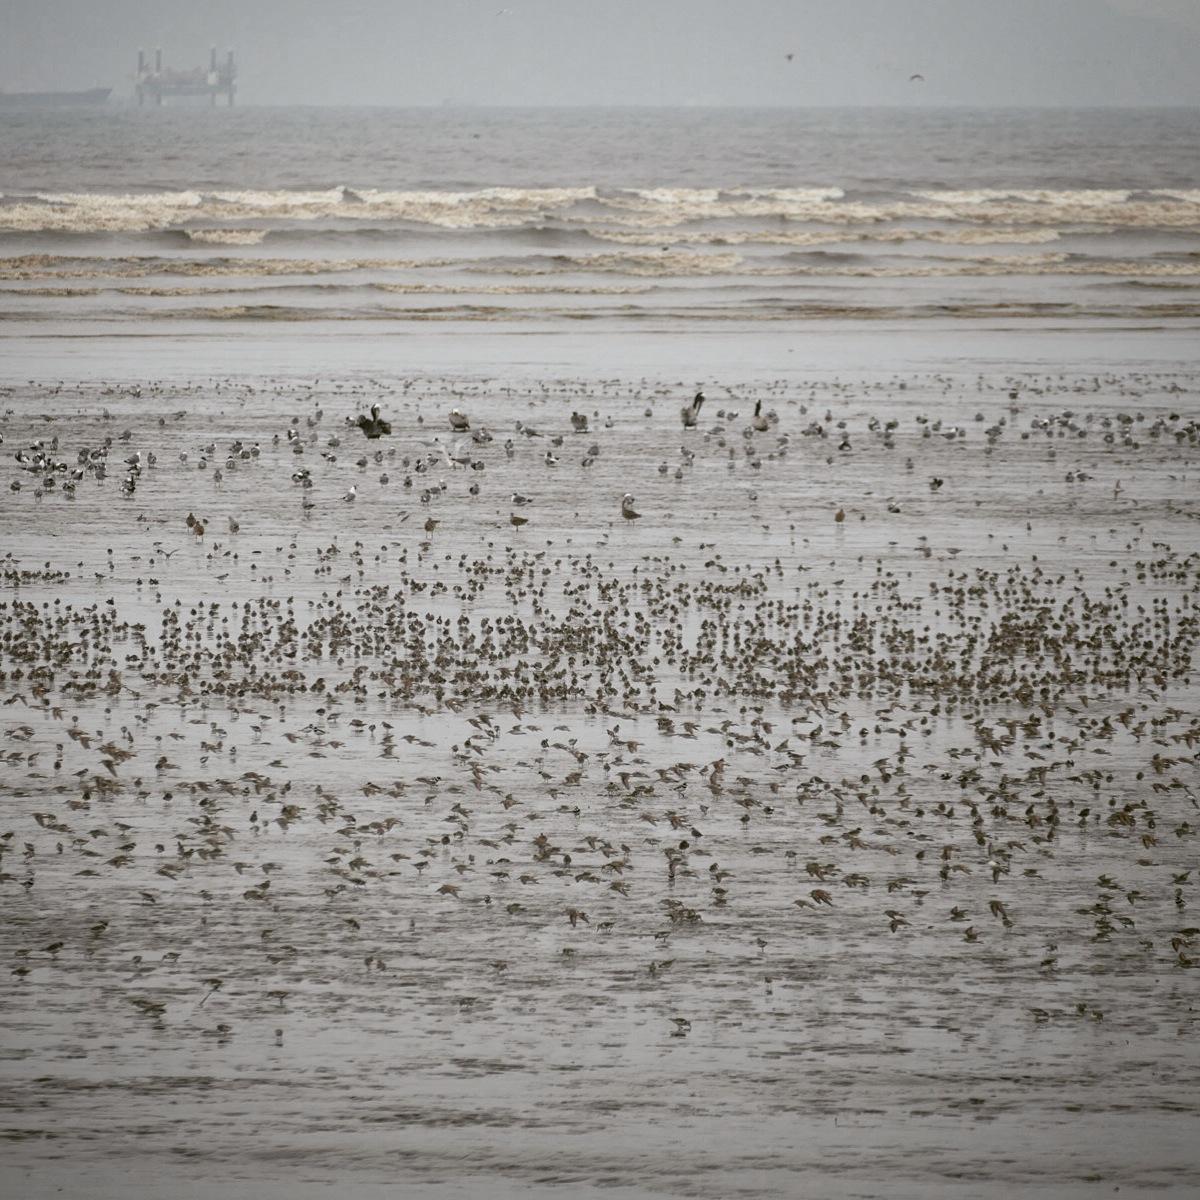 Thousands of shorebirds sift the mud near high tide on Panama Bay. Noah Strycker